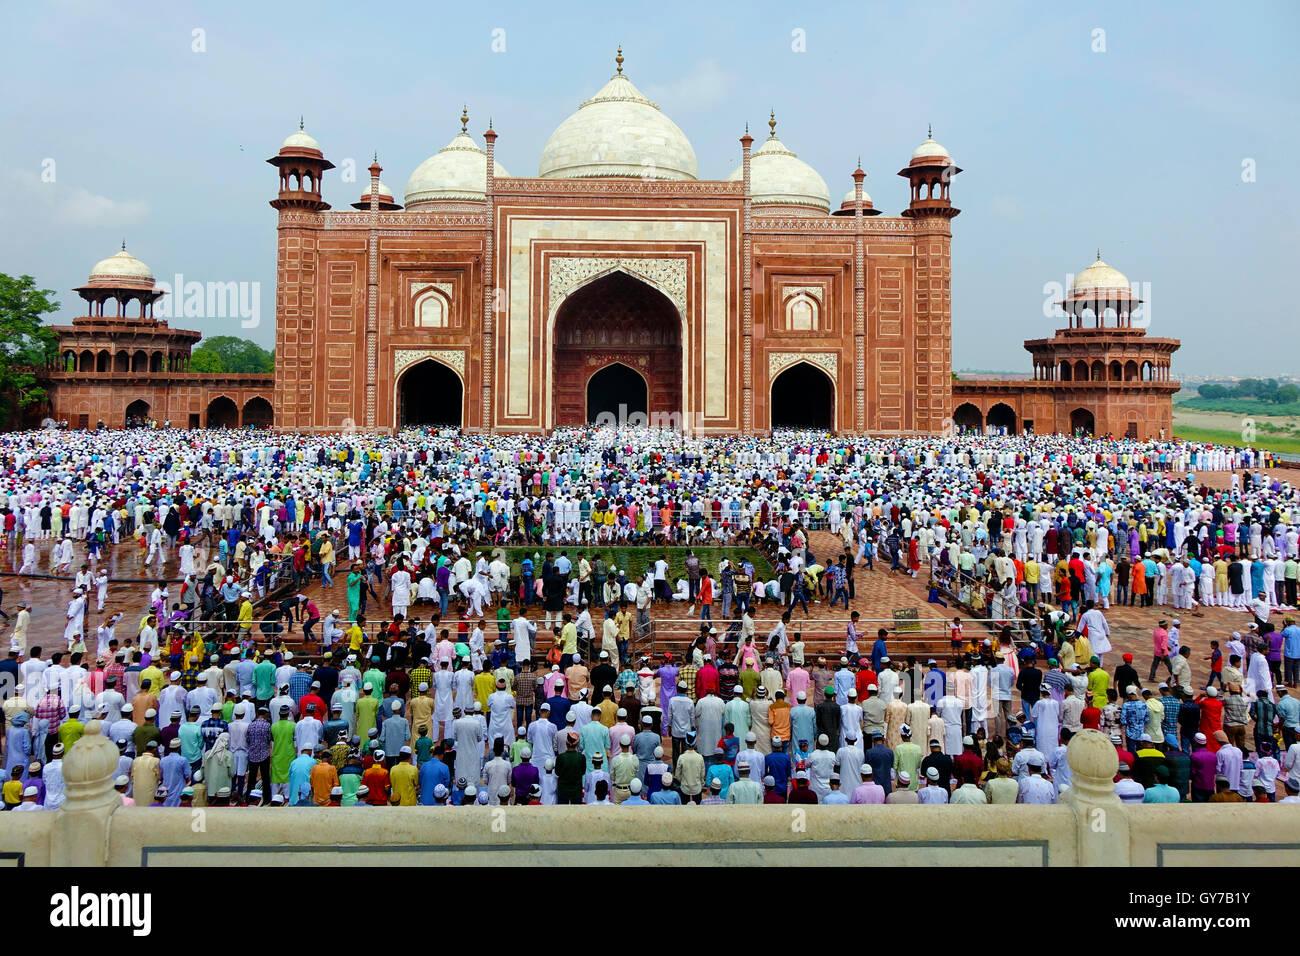 Congregation at the Ramzan Eid or Eid-ul-Fitar or Idul-Fitr festival at the Taj Mahal complex in Agra, India. - Stock Image